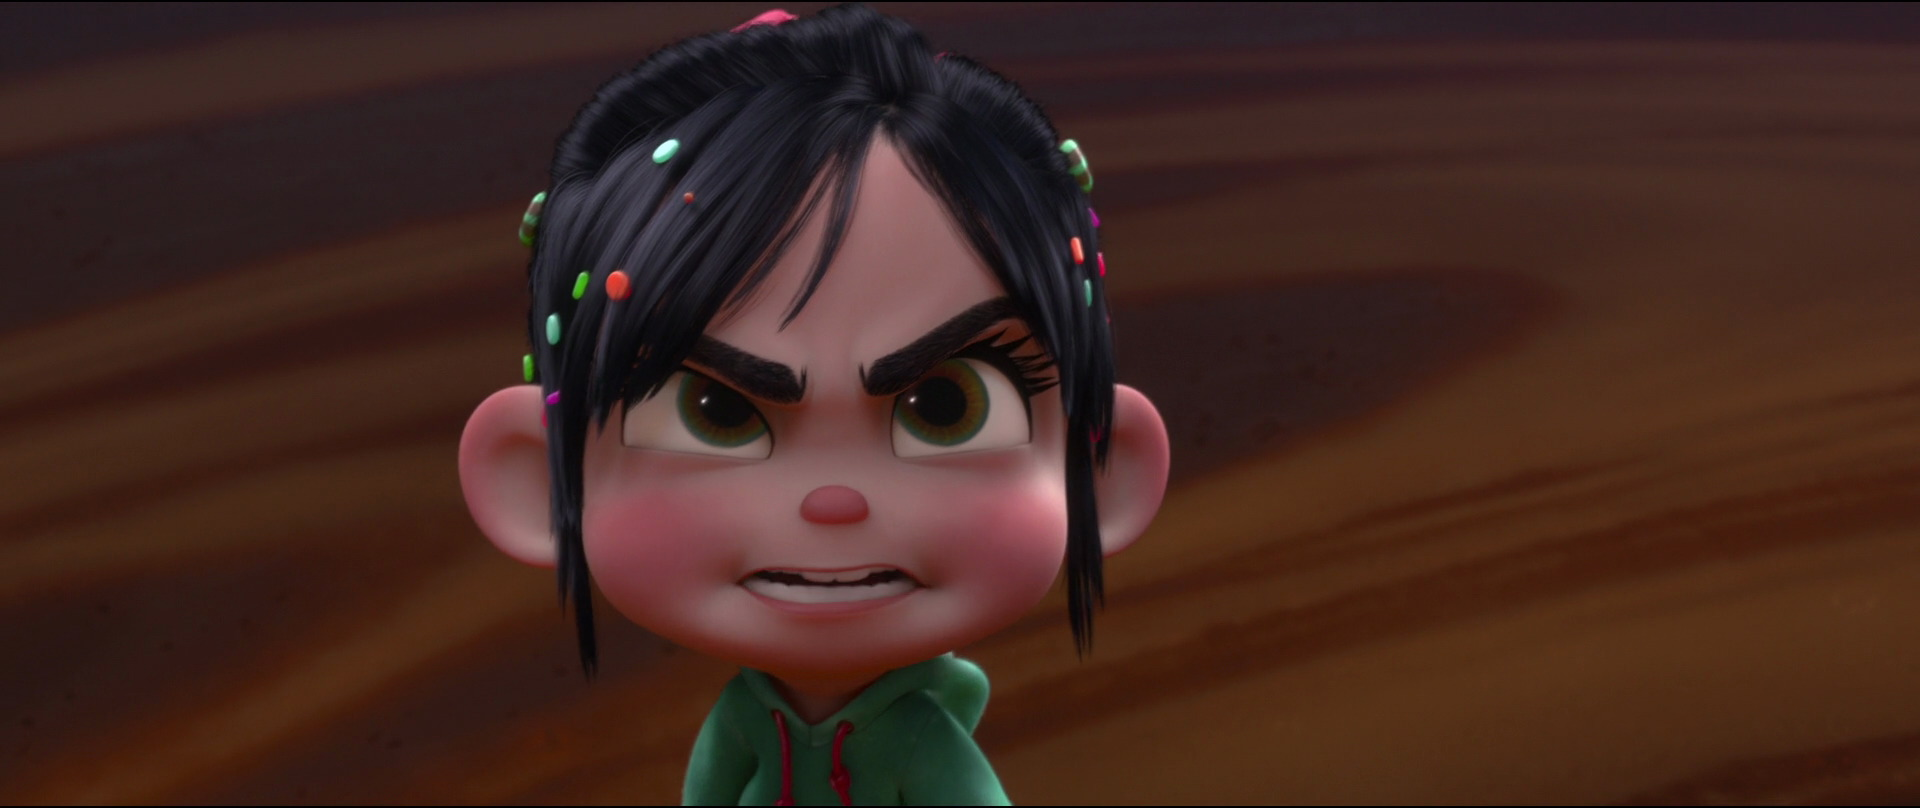 Snowanna Rainbeau Wreck It Ralph